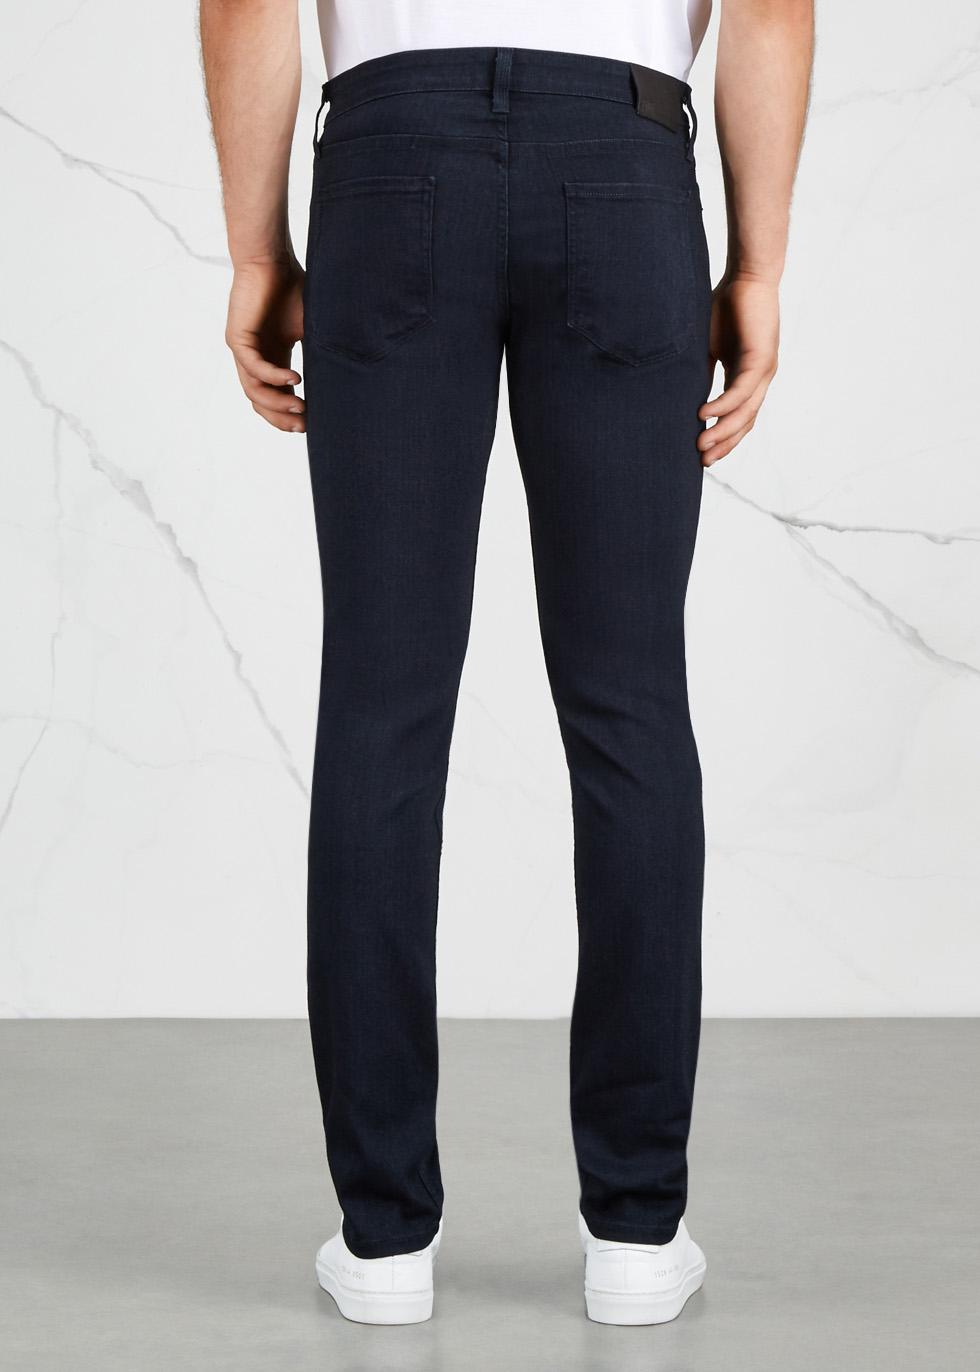 Croft indigo skinny jeans - Paige